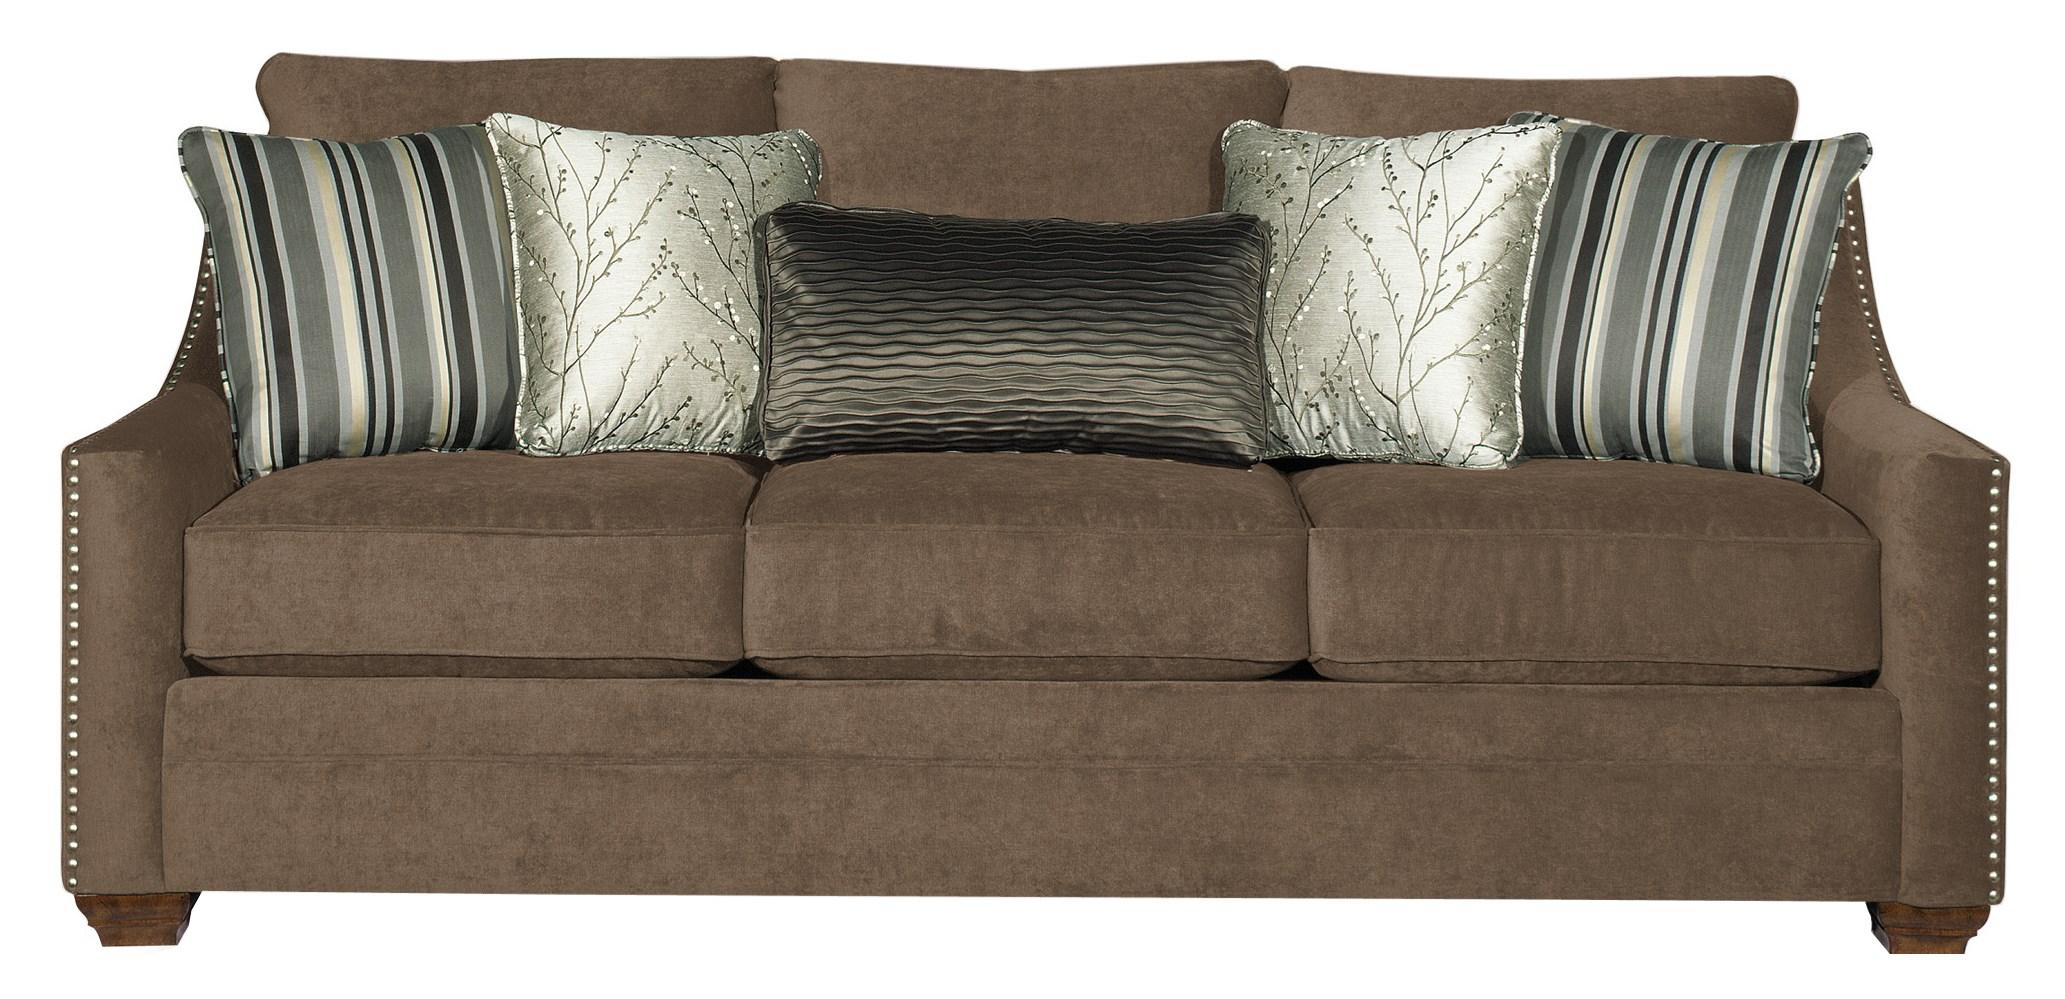 Craftmaster 7335 Sofa - Item Number: 733550-BURNISH-09